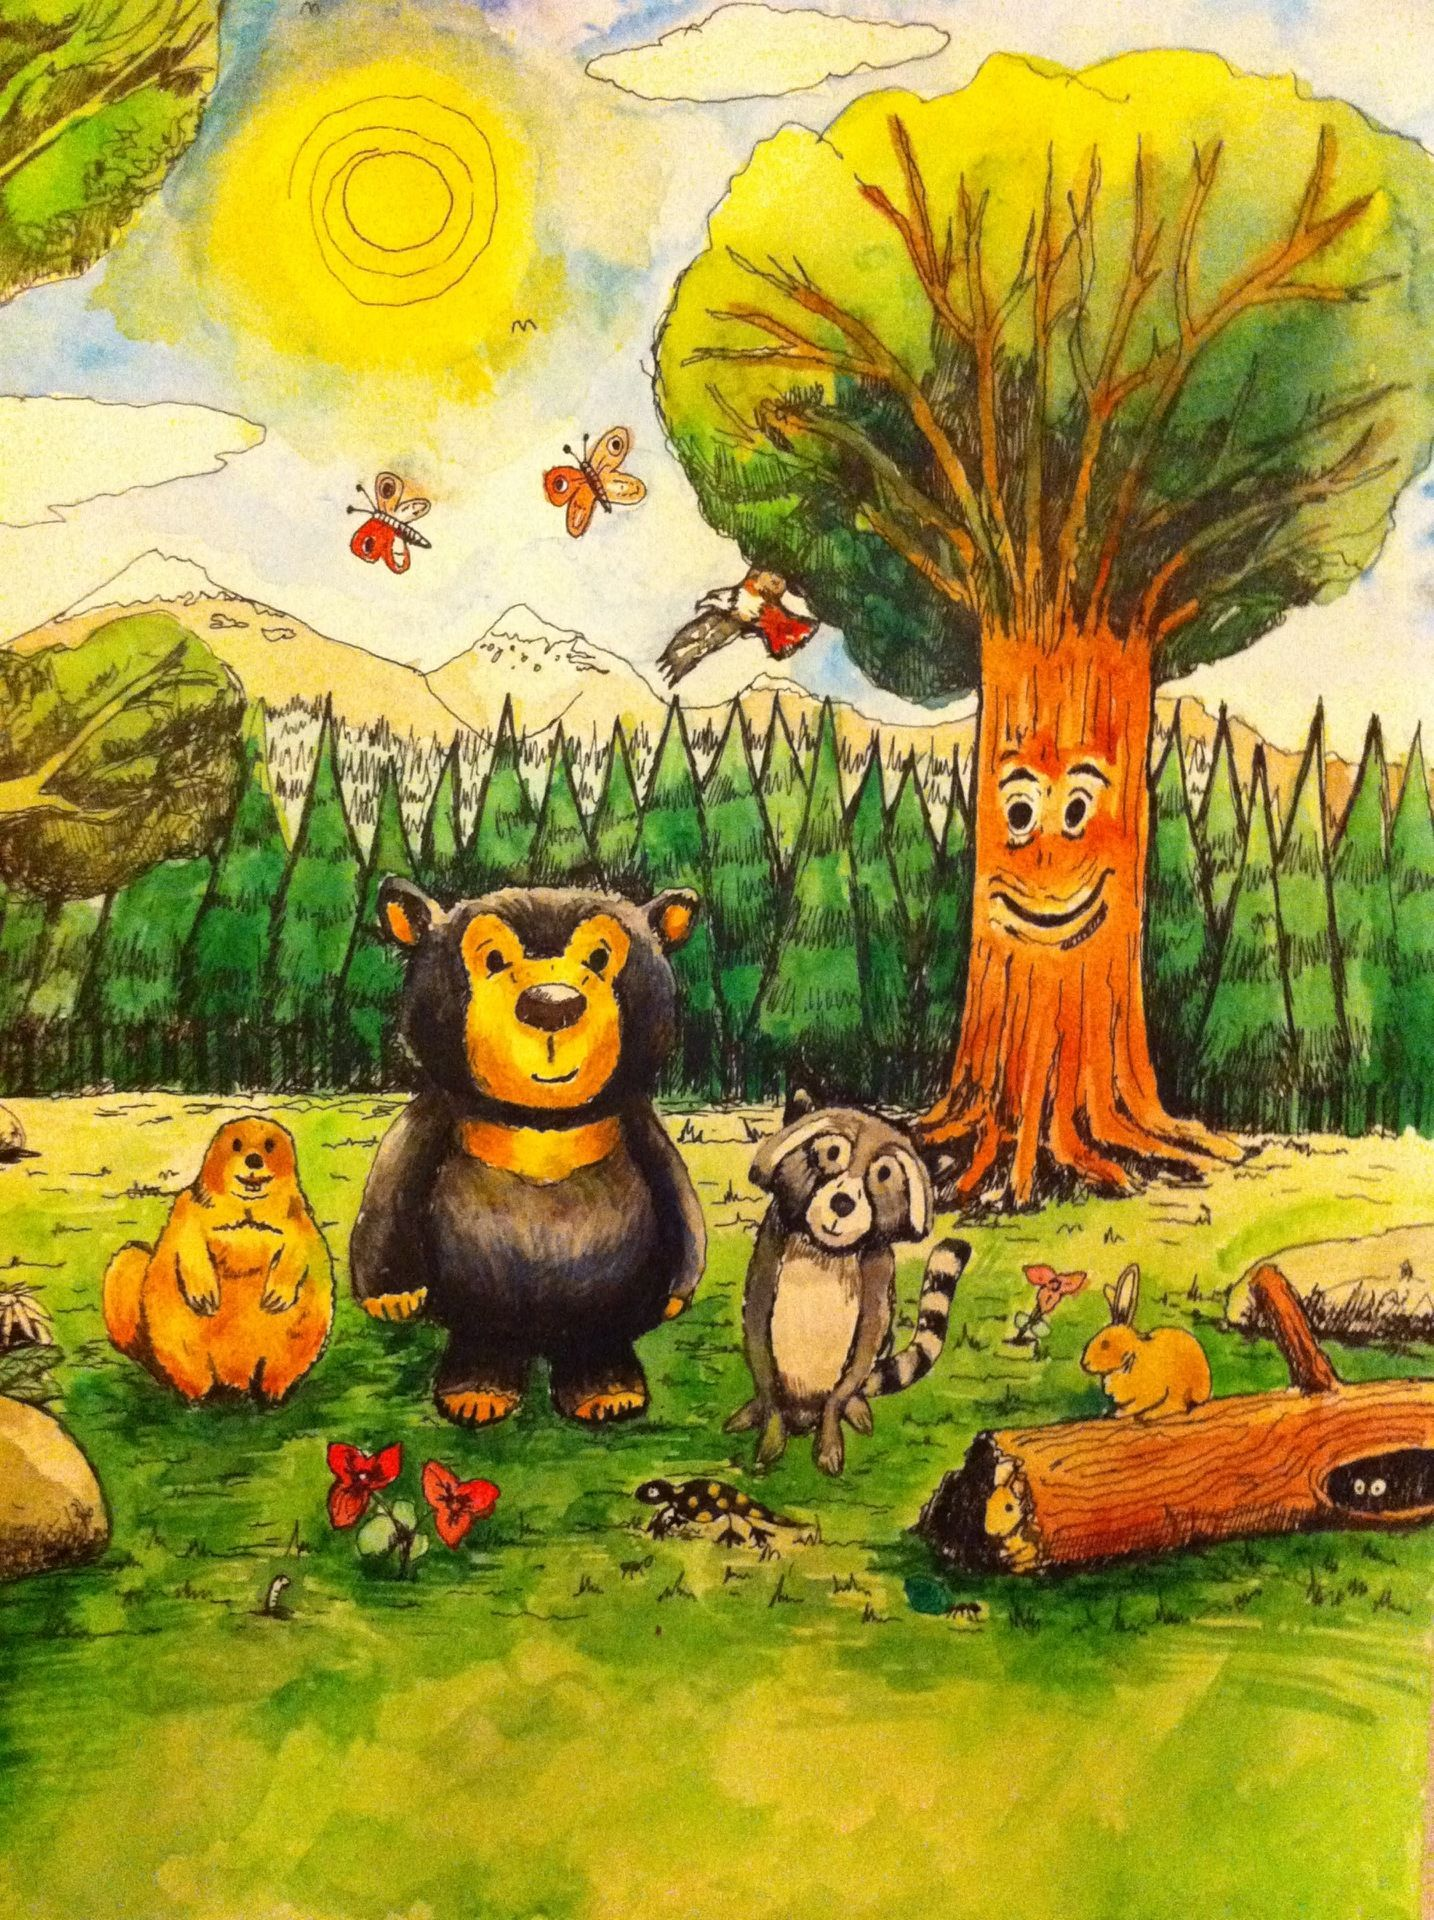 #raleighthebear #bear #blackbear #racoon #groundhog #instacool #instagood #art #watercolour #watercolourpainting #drawing # childrensbooks #follow #followback #art #tomlaird #tomlairdart